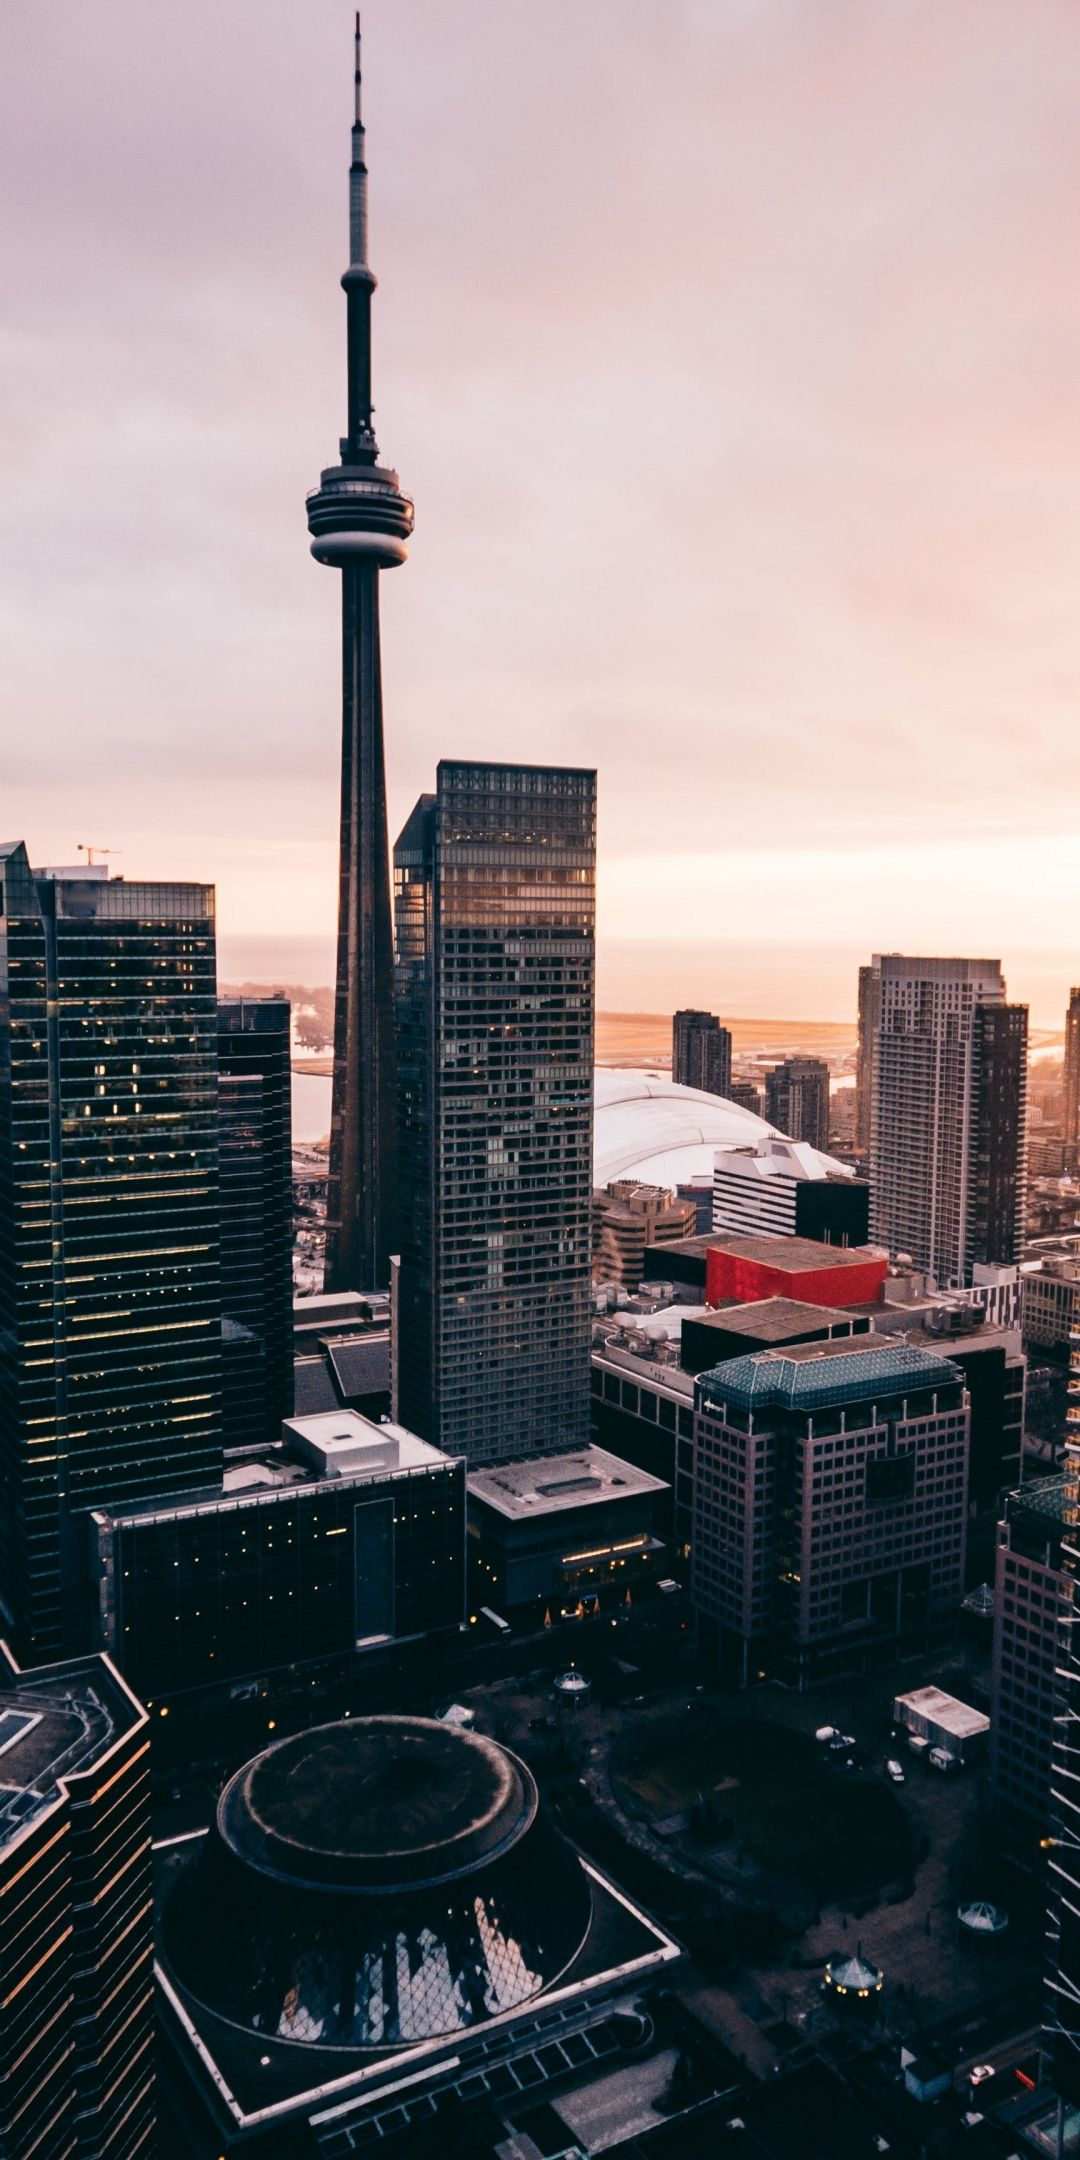 Cn Tower Toronto Buildings 1080x2160 Wallpaper Wallpaper Toronto Wallpaper Canada Canada Photography